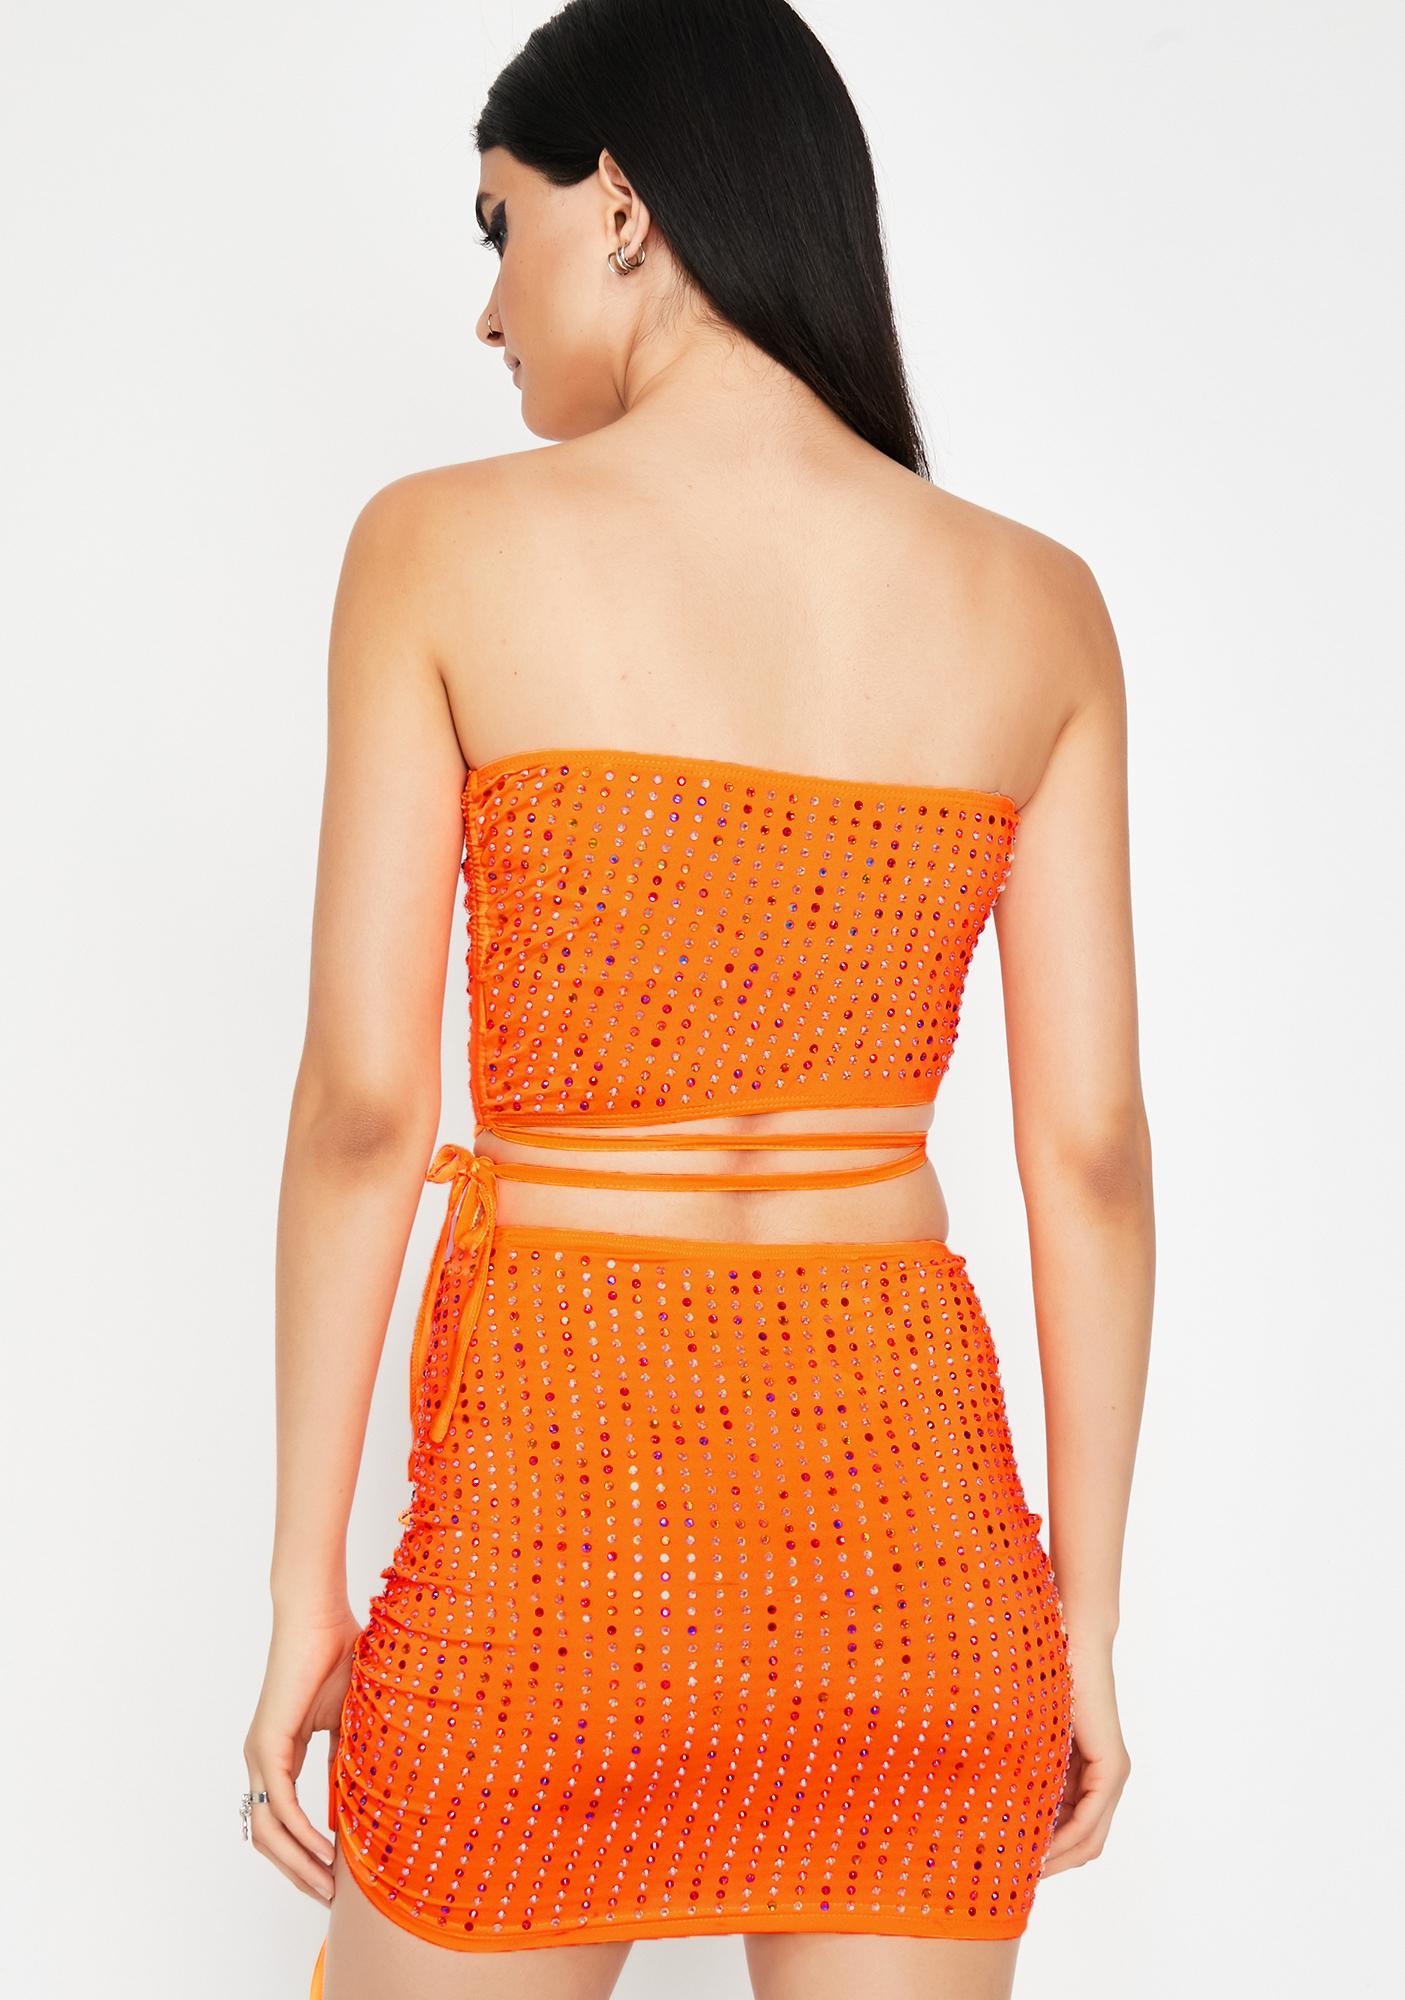 Infamous Illusion Skirt Set